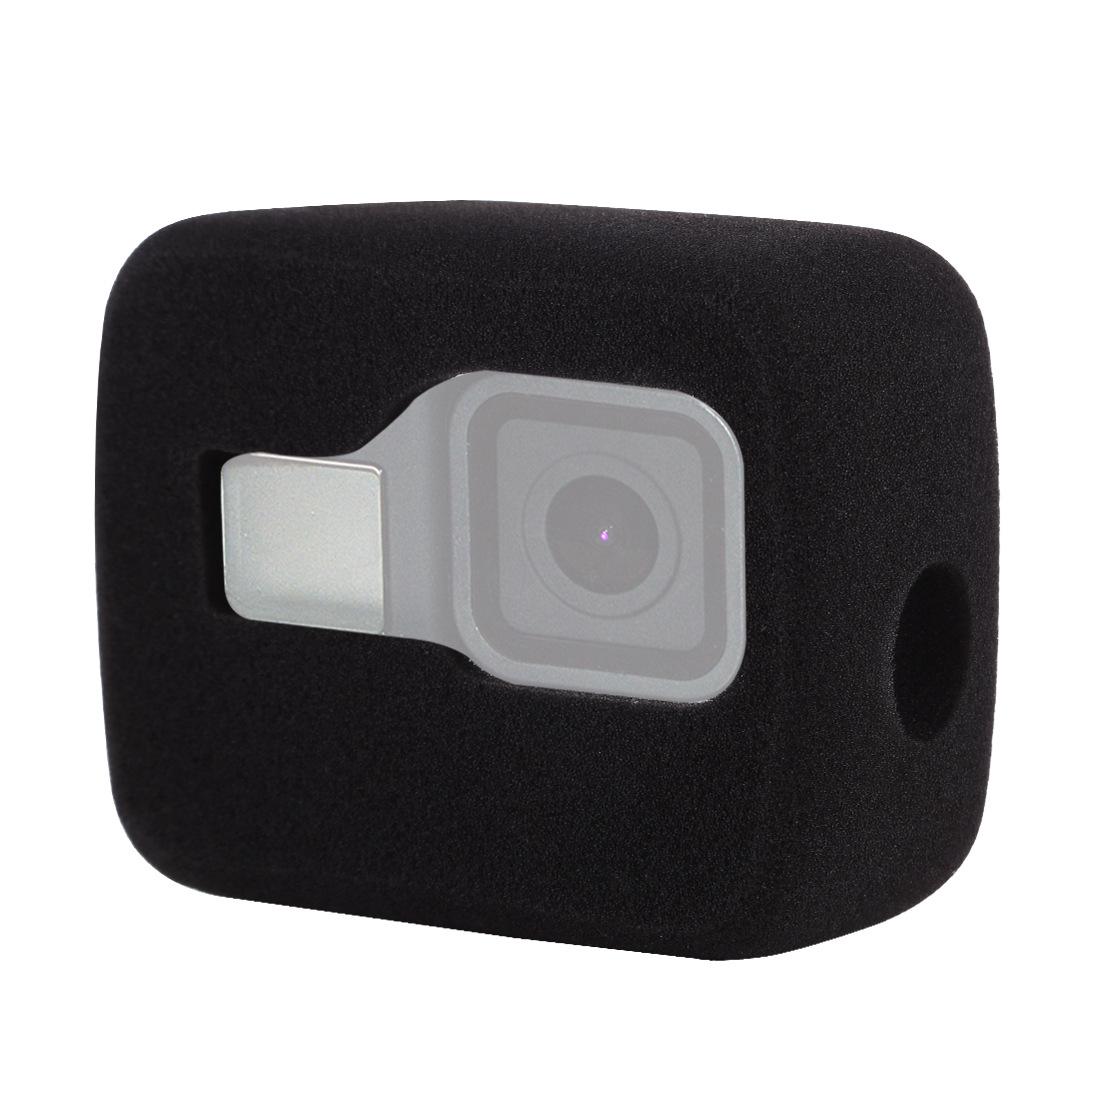 ND1000 Lens Filter for DJI Osmo Action GoPro HERO8 Black Host Windshield Noise Reduction Foam Cover black